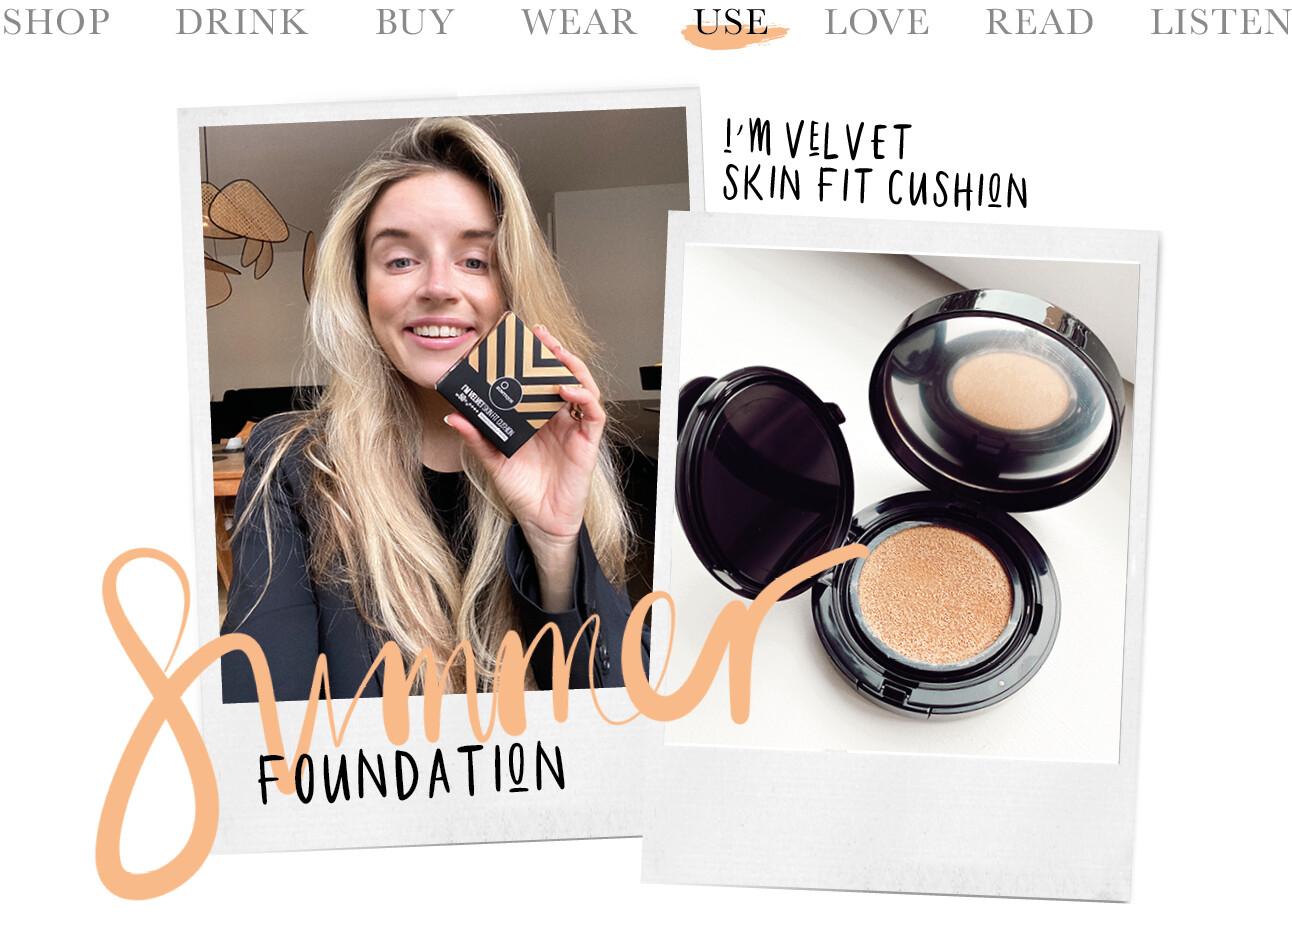 Suntique foundation I'm Velvet skin fit cushion